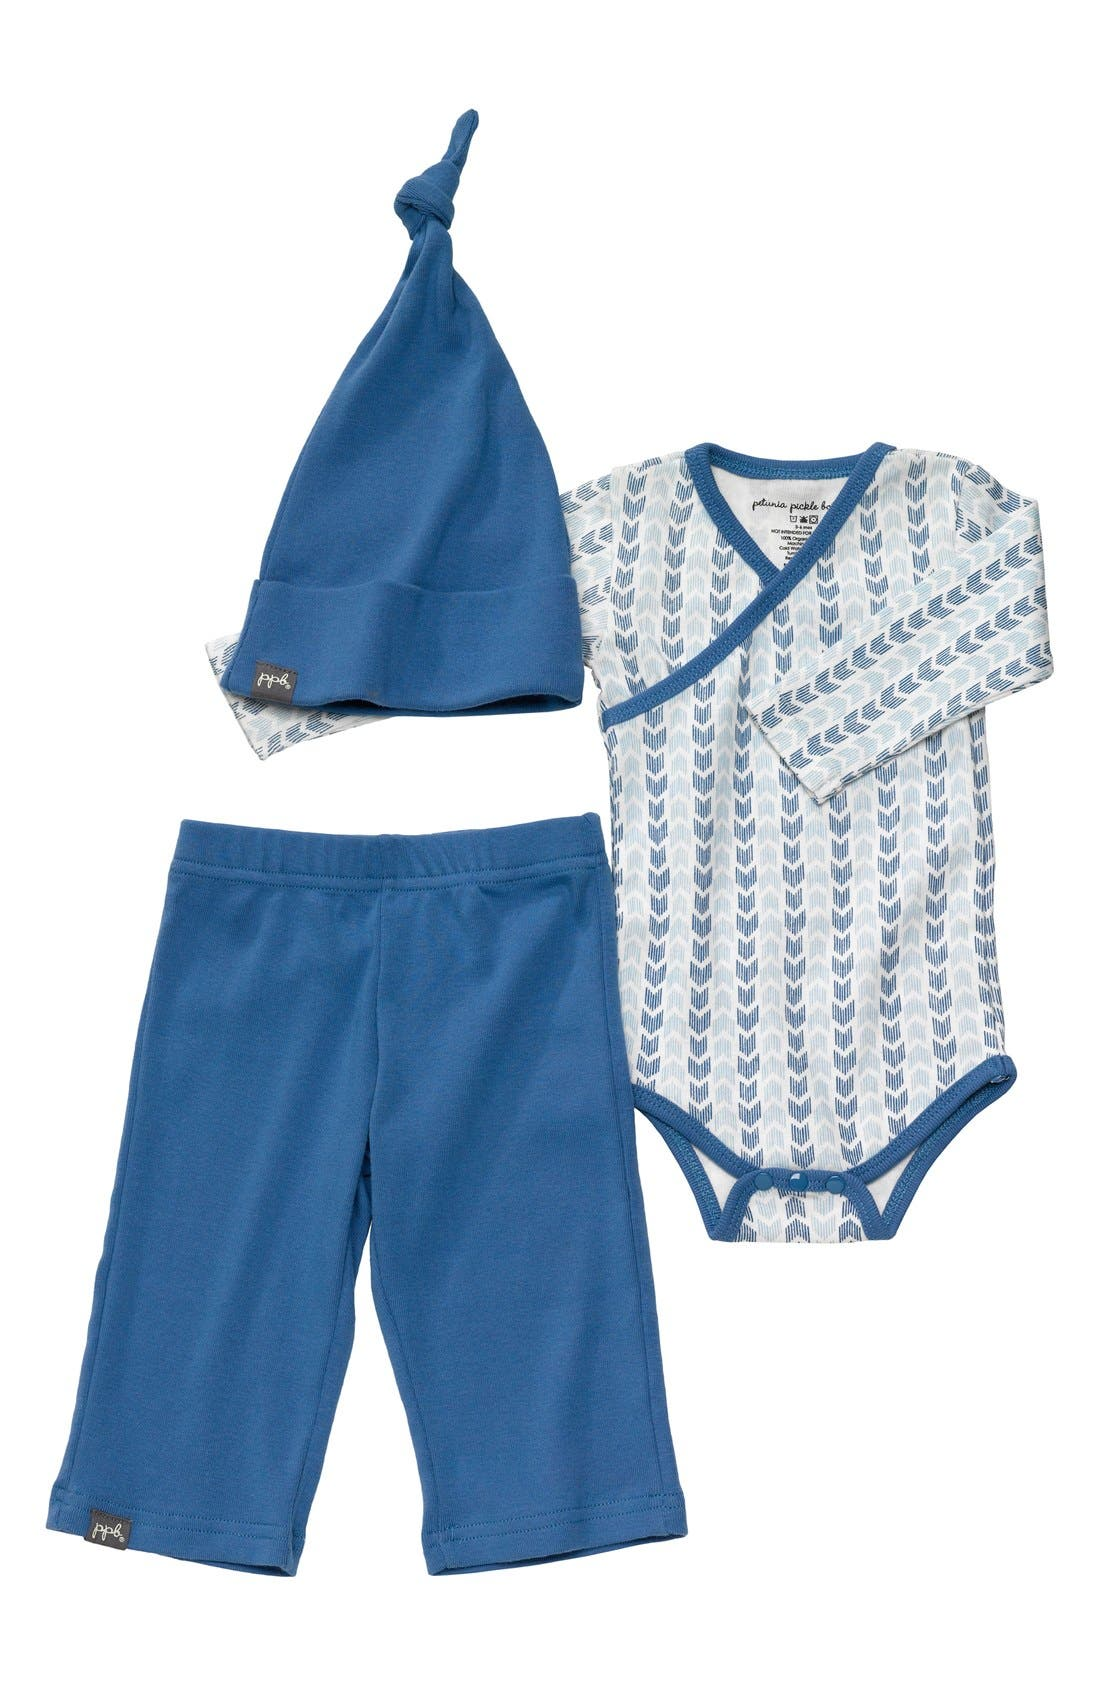 Alternate Image 1 Selected - Petunia Pickle Bottom 'Social' Hat, Bodysuit & Pants Set (Baby)